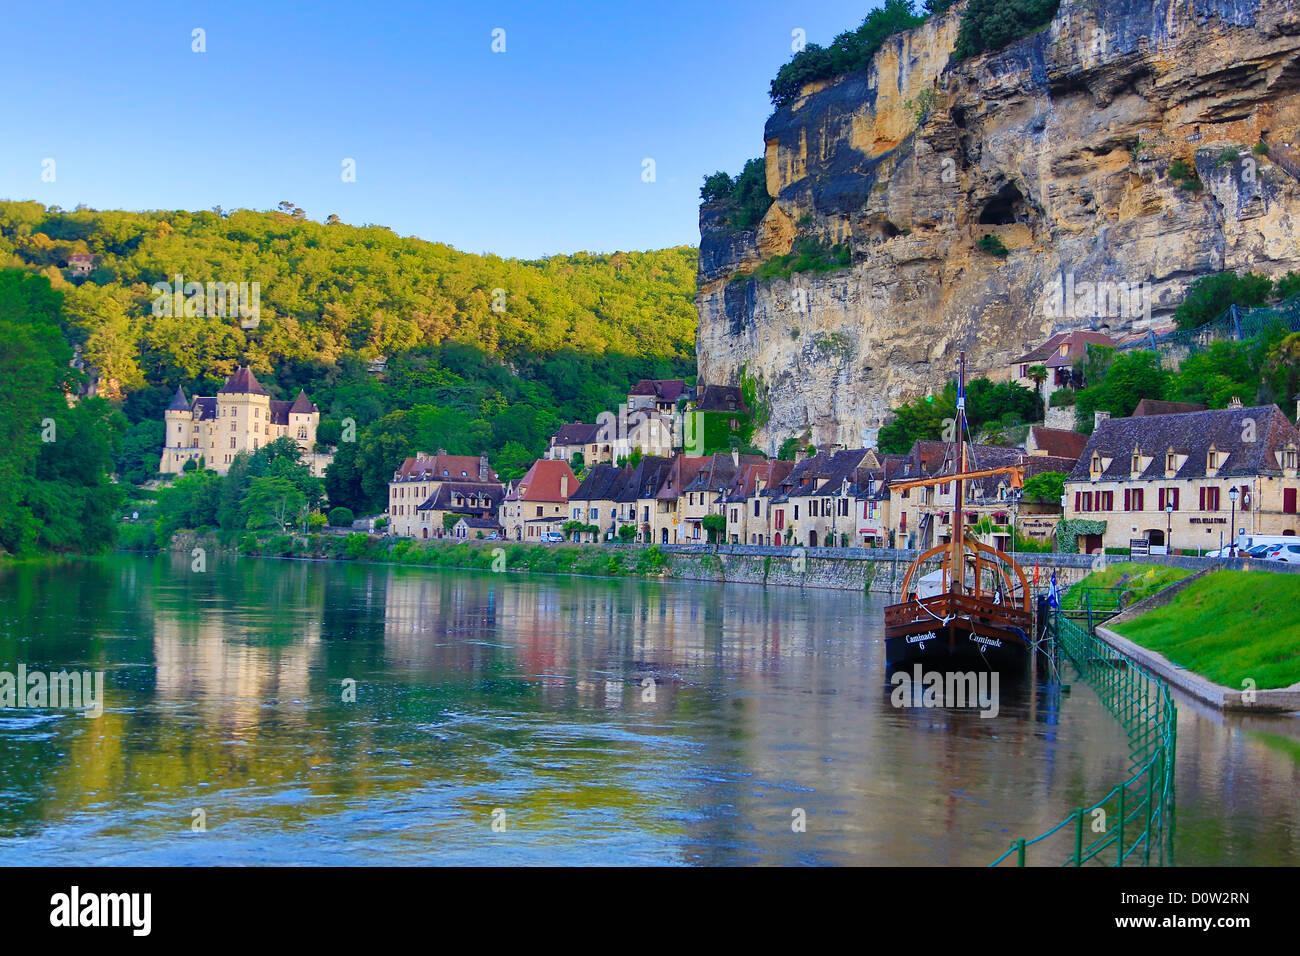 France, Europe, travel, Dordogne, La Roque Gageac, Malartie, Castle, architecture, medieval, reflection, river, Stock Photo